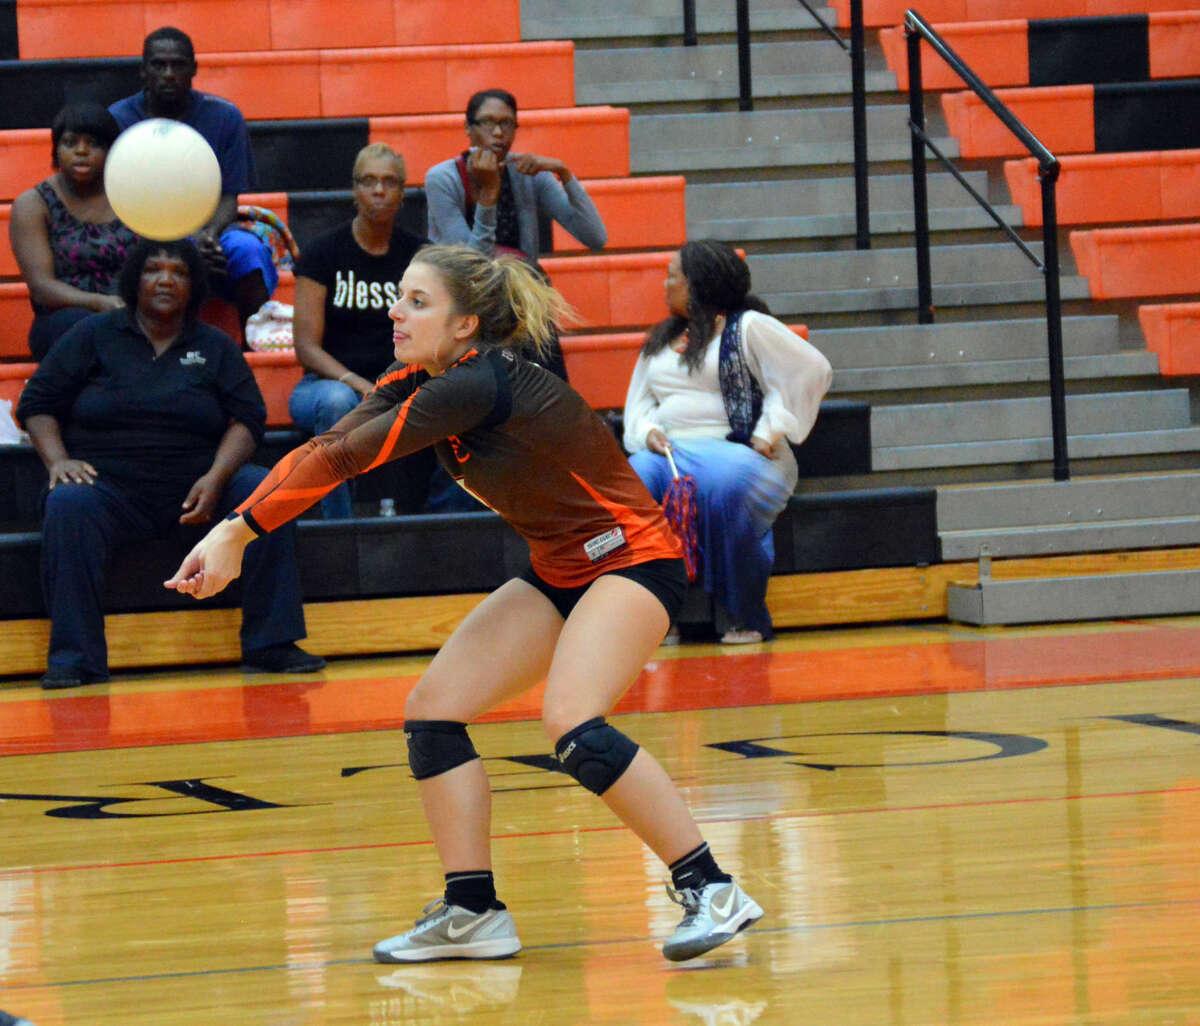 Edwardsville defensive specialist Nicki Meyer successfully receives a serve.